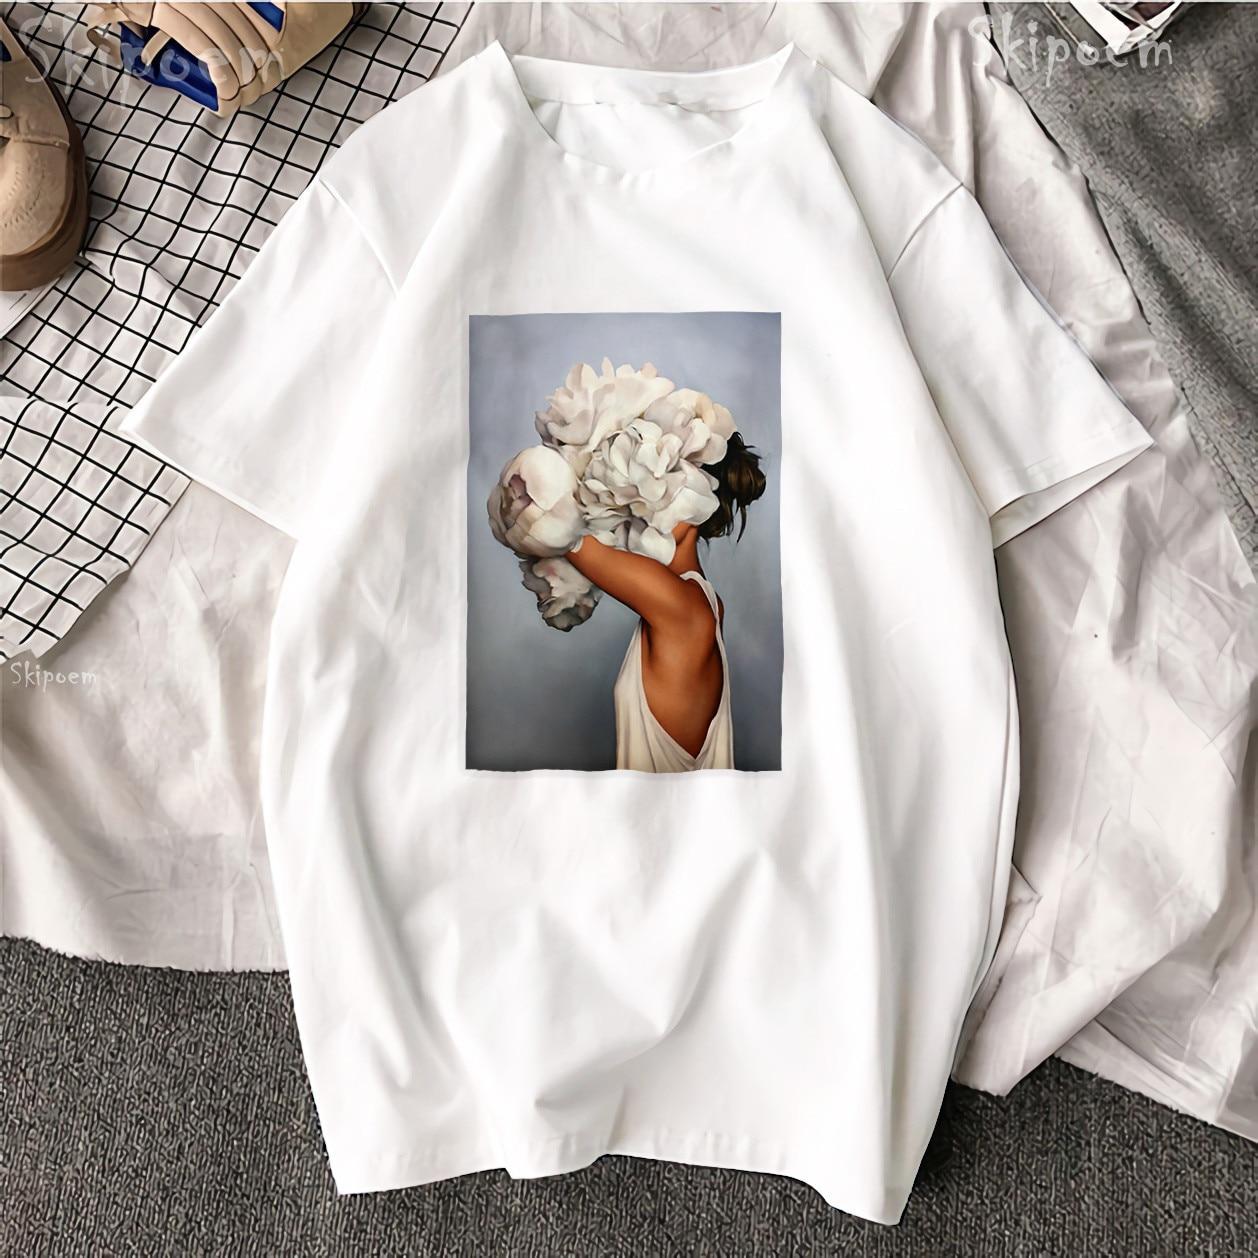 Novo Harajuku Algodão Estética Tshirt Sexy Flores Pena Imprimir Manga Curta Tops & T Moda Casual Camisa T Casal